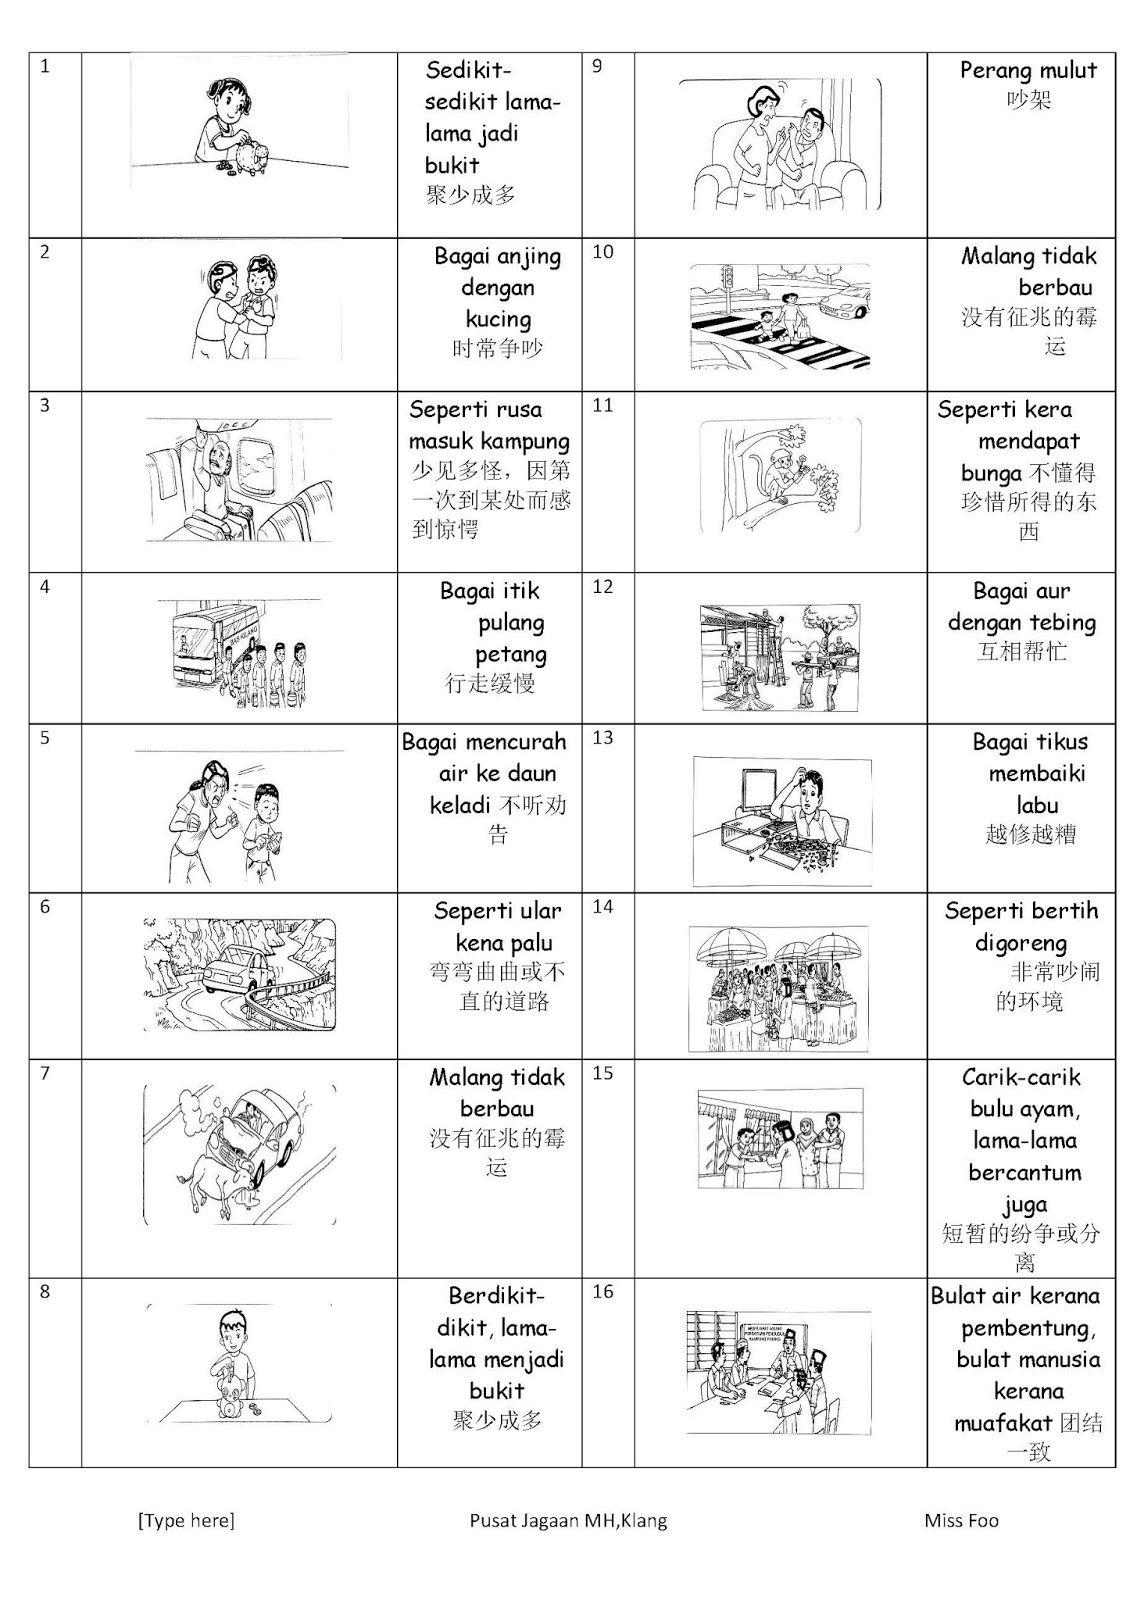 Free Download 260 Nota Peribahasa Bergambar 260句国语谚语下载 Malay Language Kindergarten Reading Worksheets Study Materials